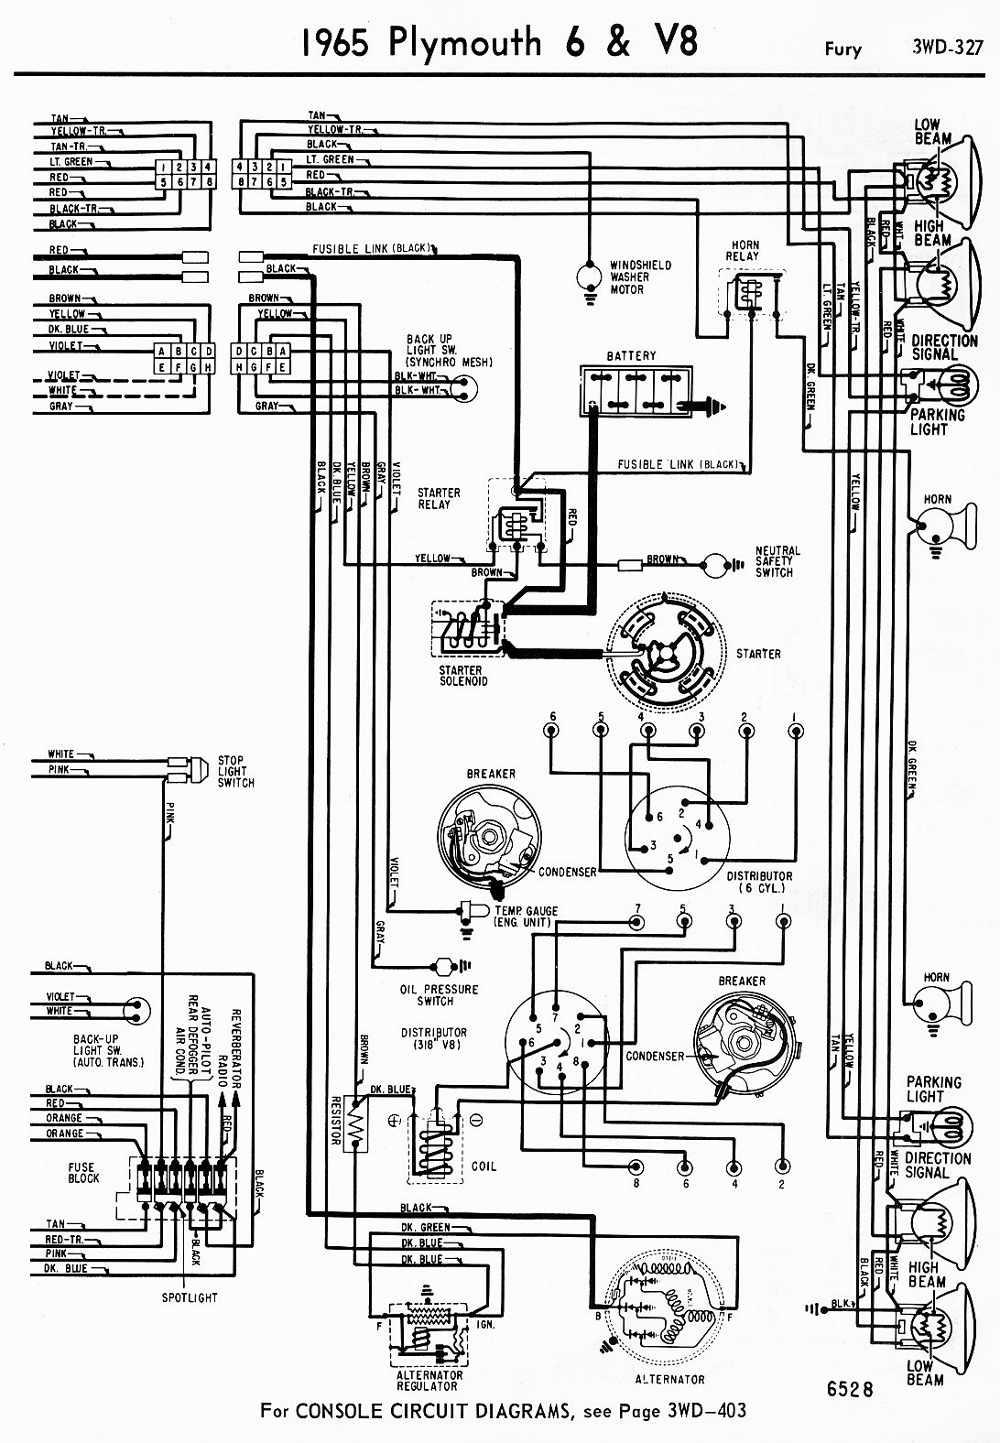 1974 plymouth fury wiring diagram